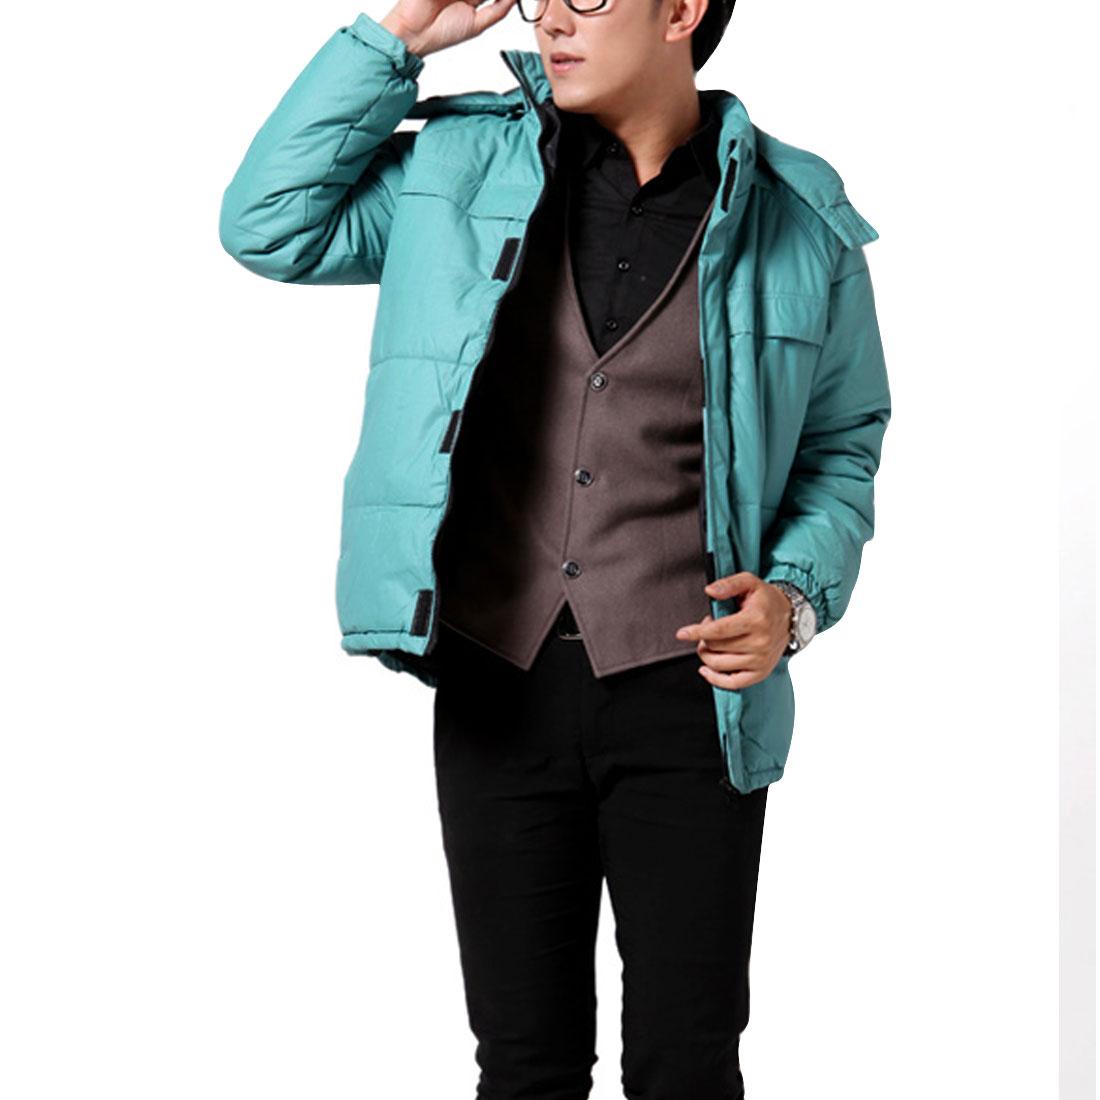 Aqua Thicking Raglan Sleeve Zip Up Padded Warm Jacket Man S